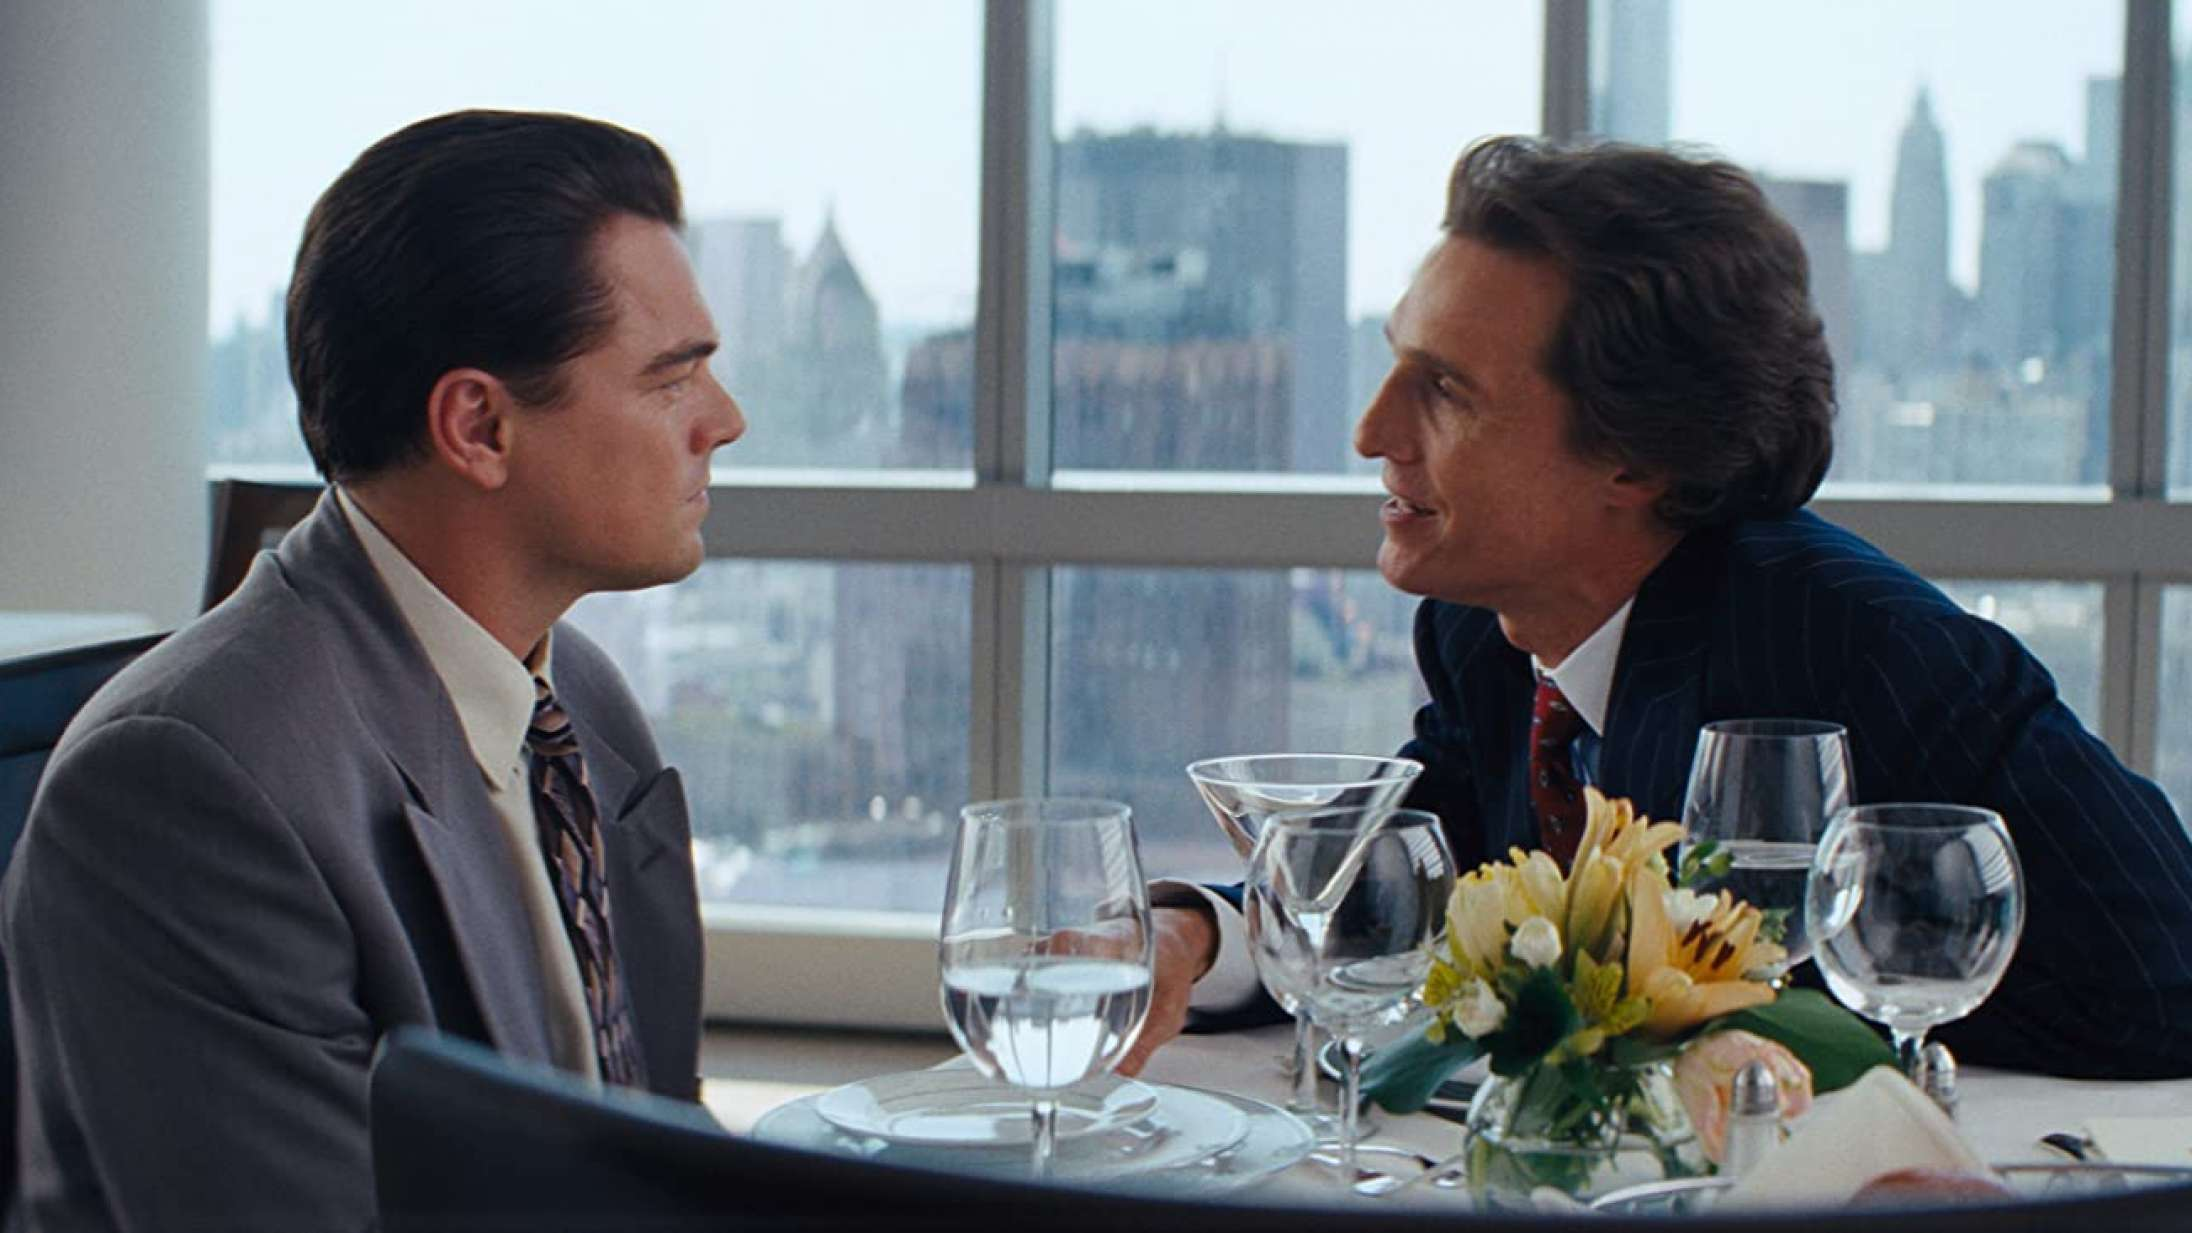 Matthew McConaughey fortæller, hvordan Leonardo DiCaprio fandt på den ikoniske nynnen i 'The Wolf of Wall Street'